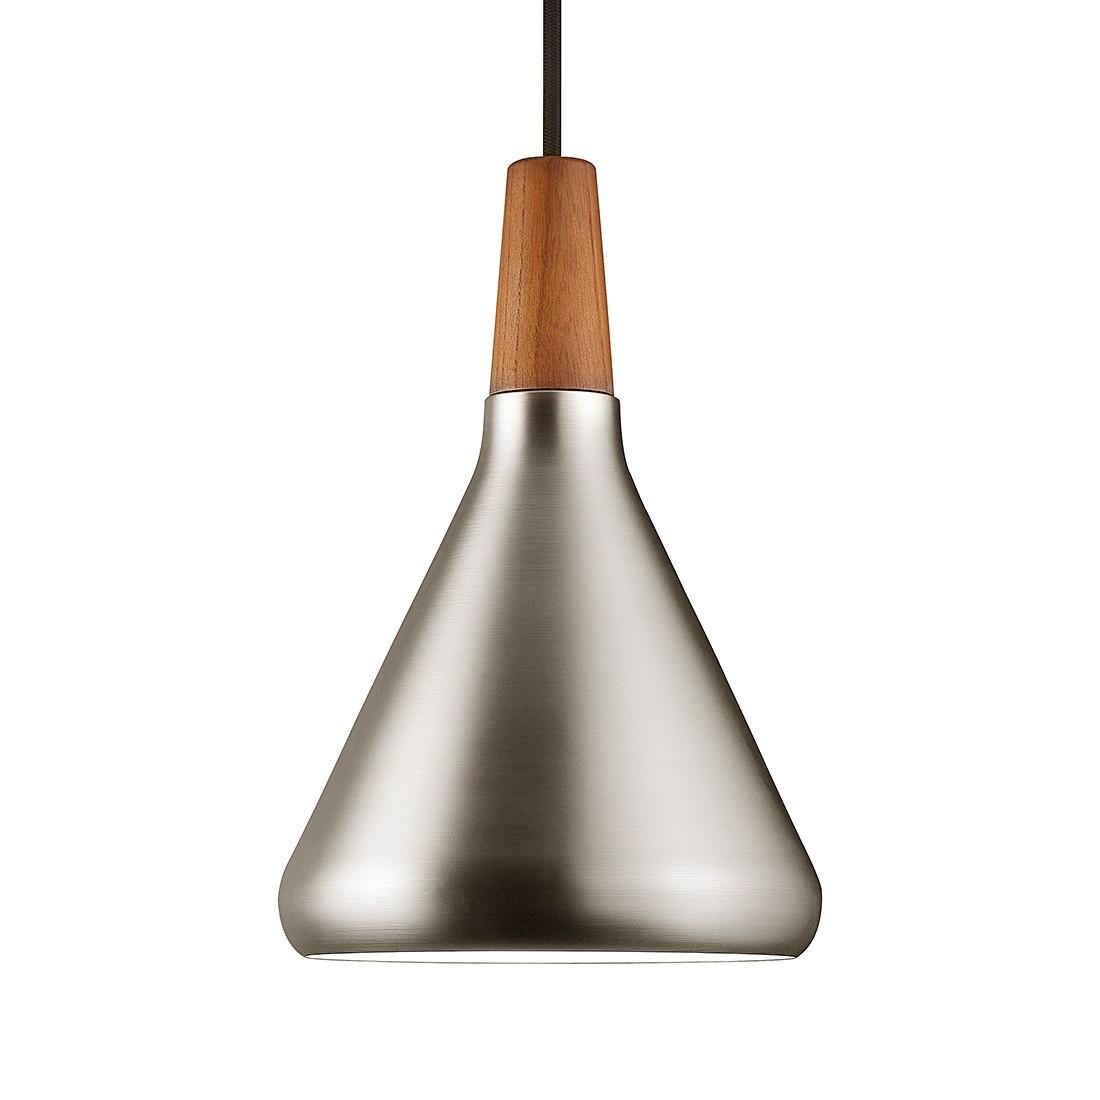 EEK A++, Pendelleuchte Float 18 - Metall - Silber - 1-flammig, Nordlux